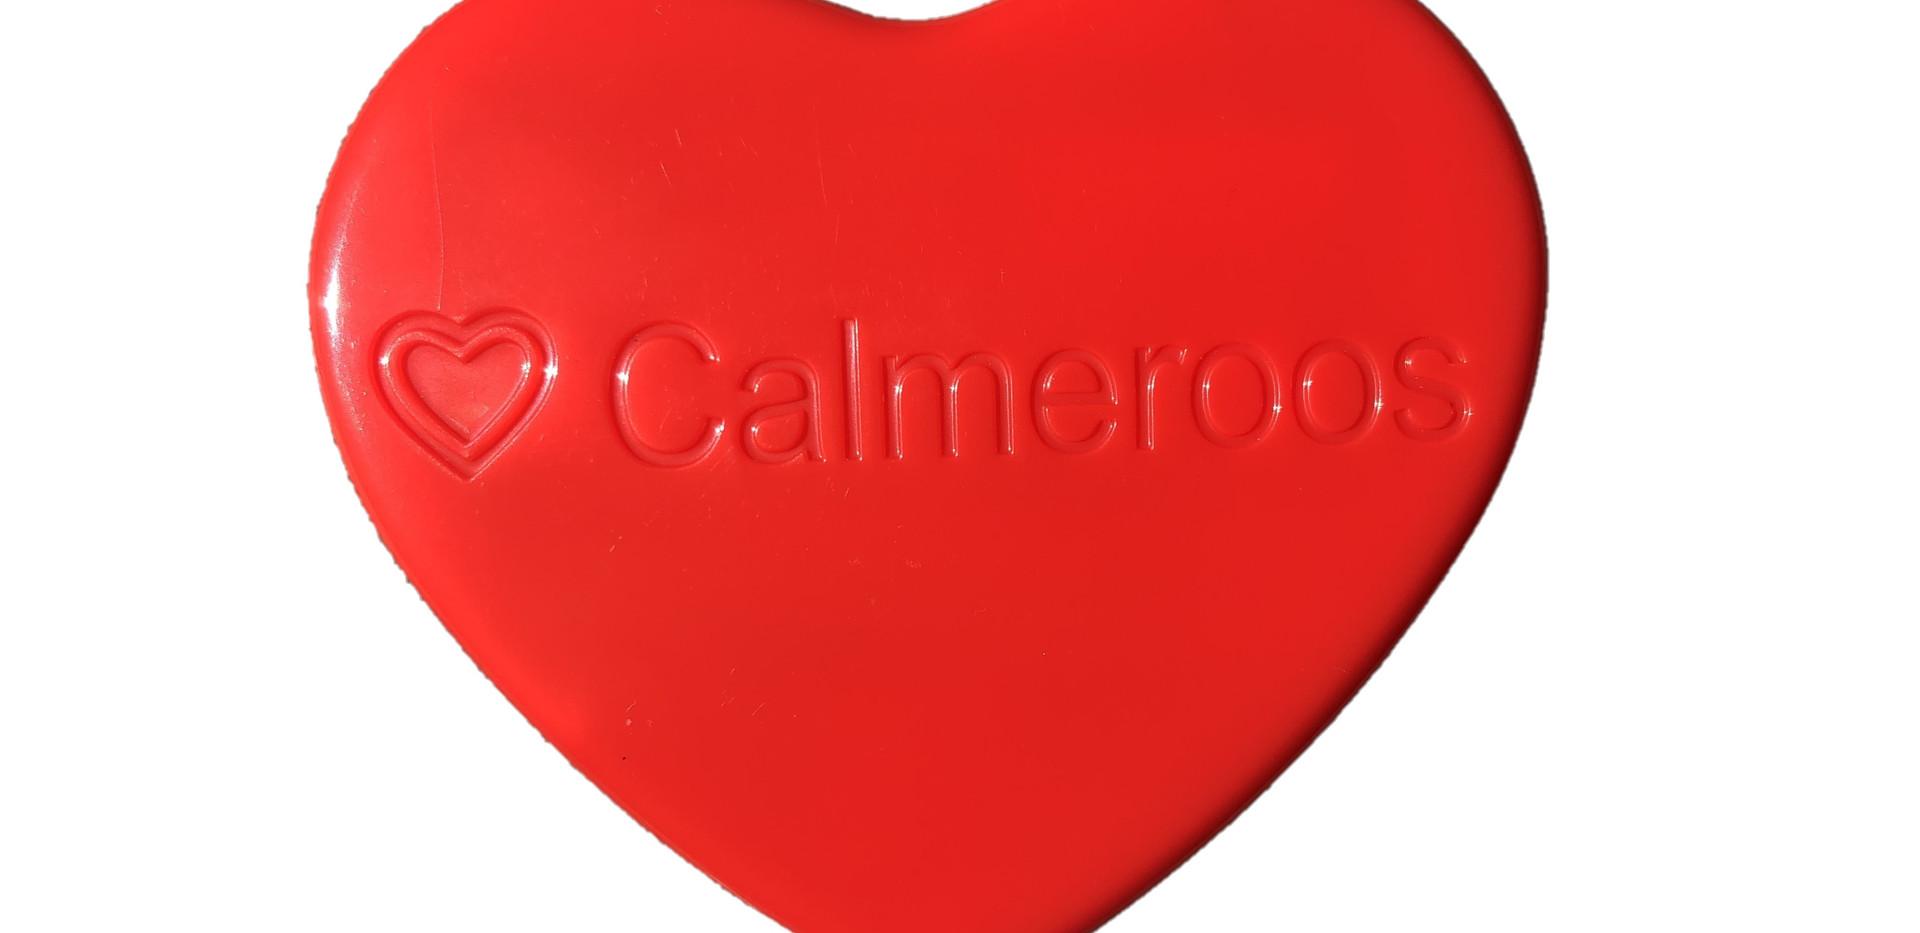 Calmeroos Heart Replacement